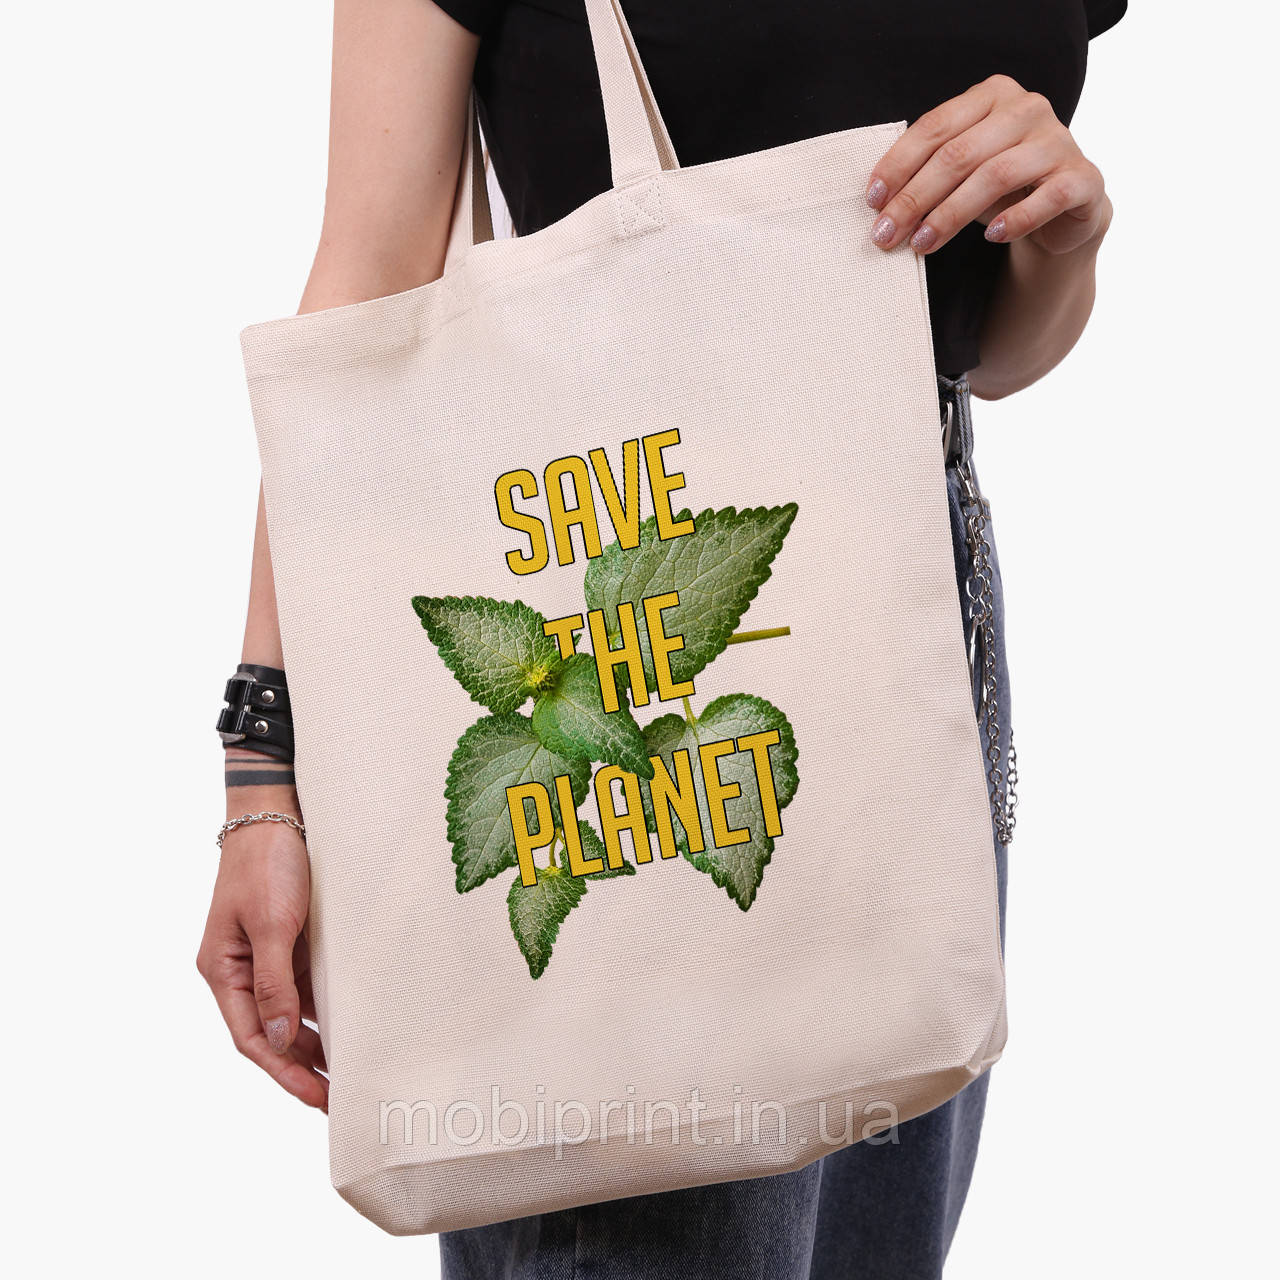 Эко сумка шоппер белая Экология (Ecology) (9227-1336-1)  экосумка шопер 41*39*8 см